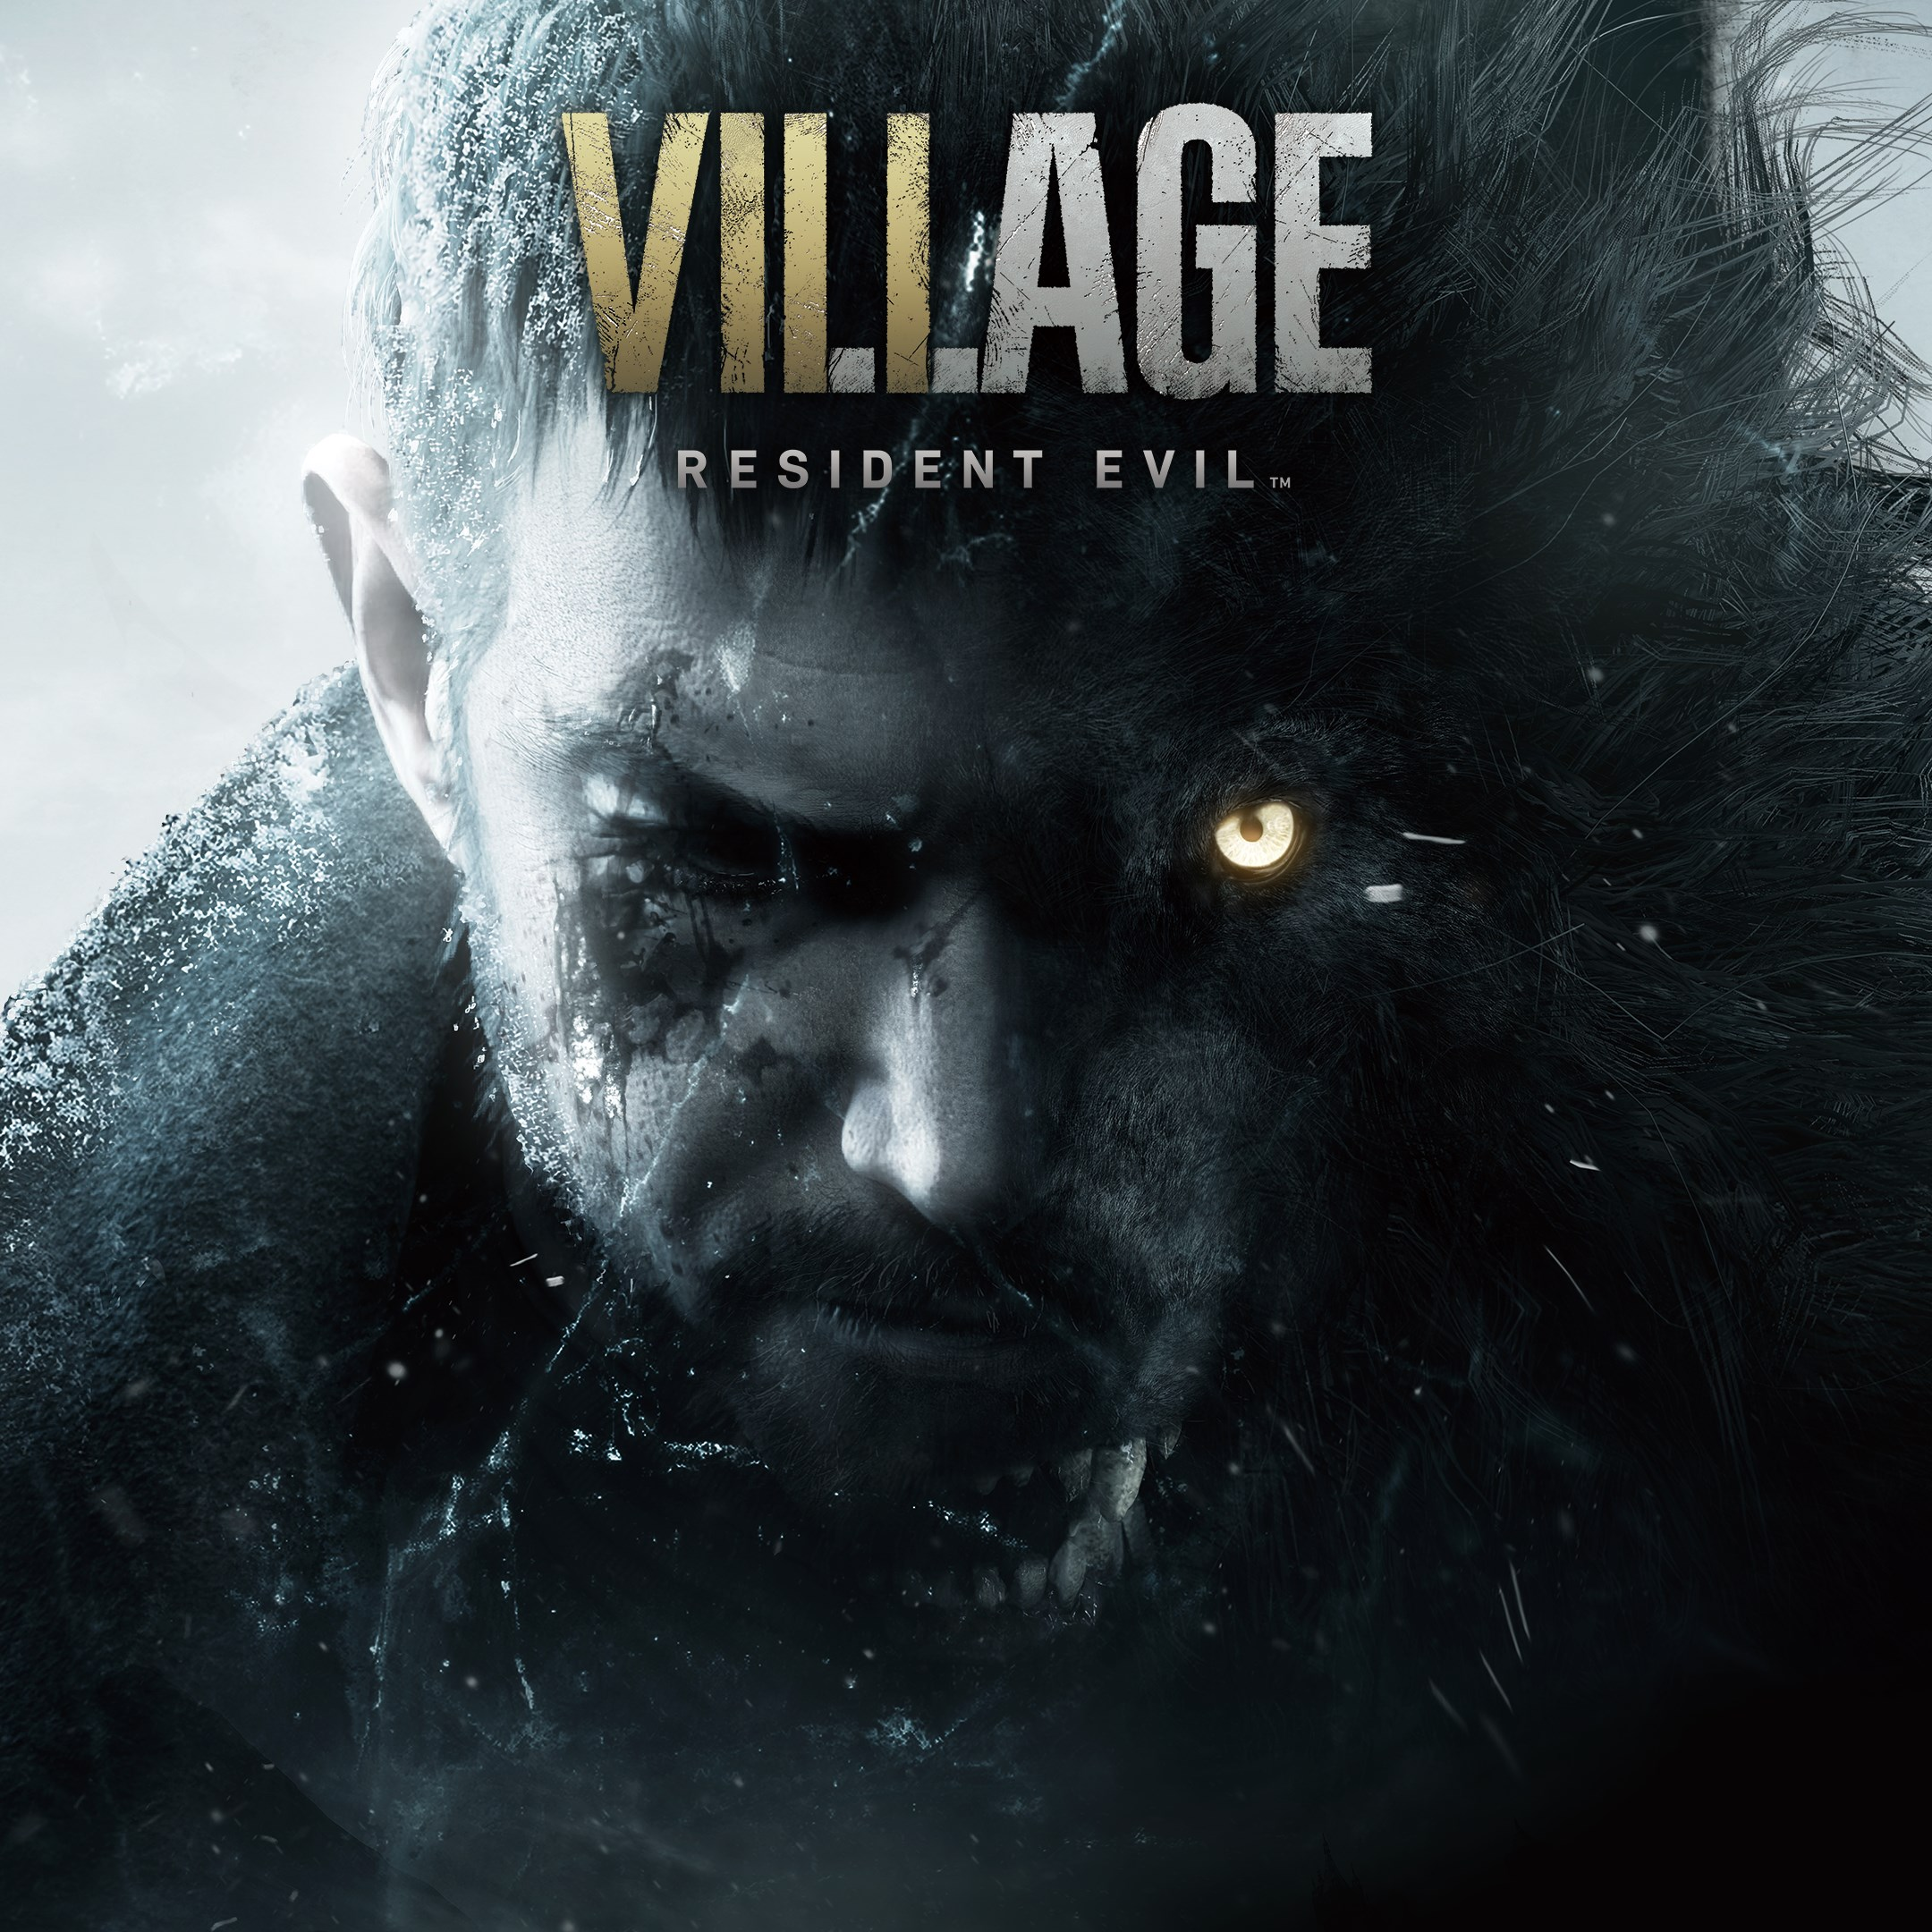 Image for Resident Evil Village